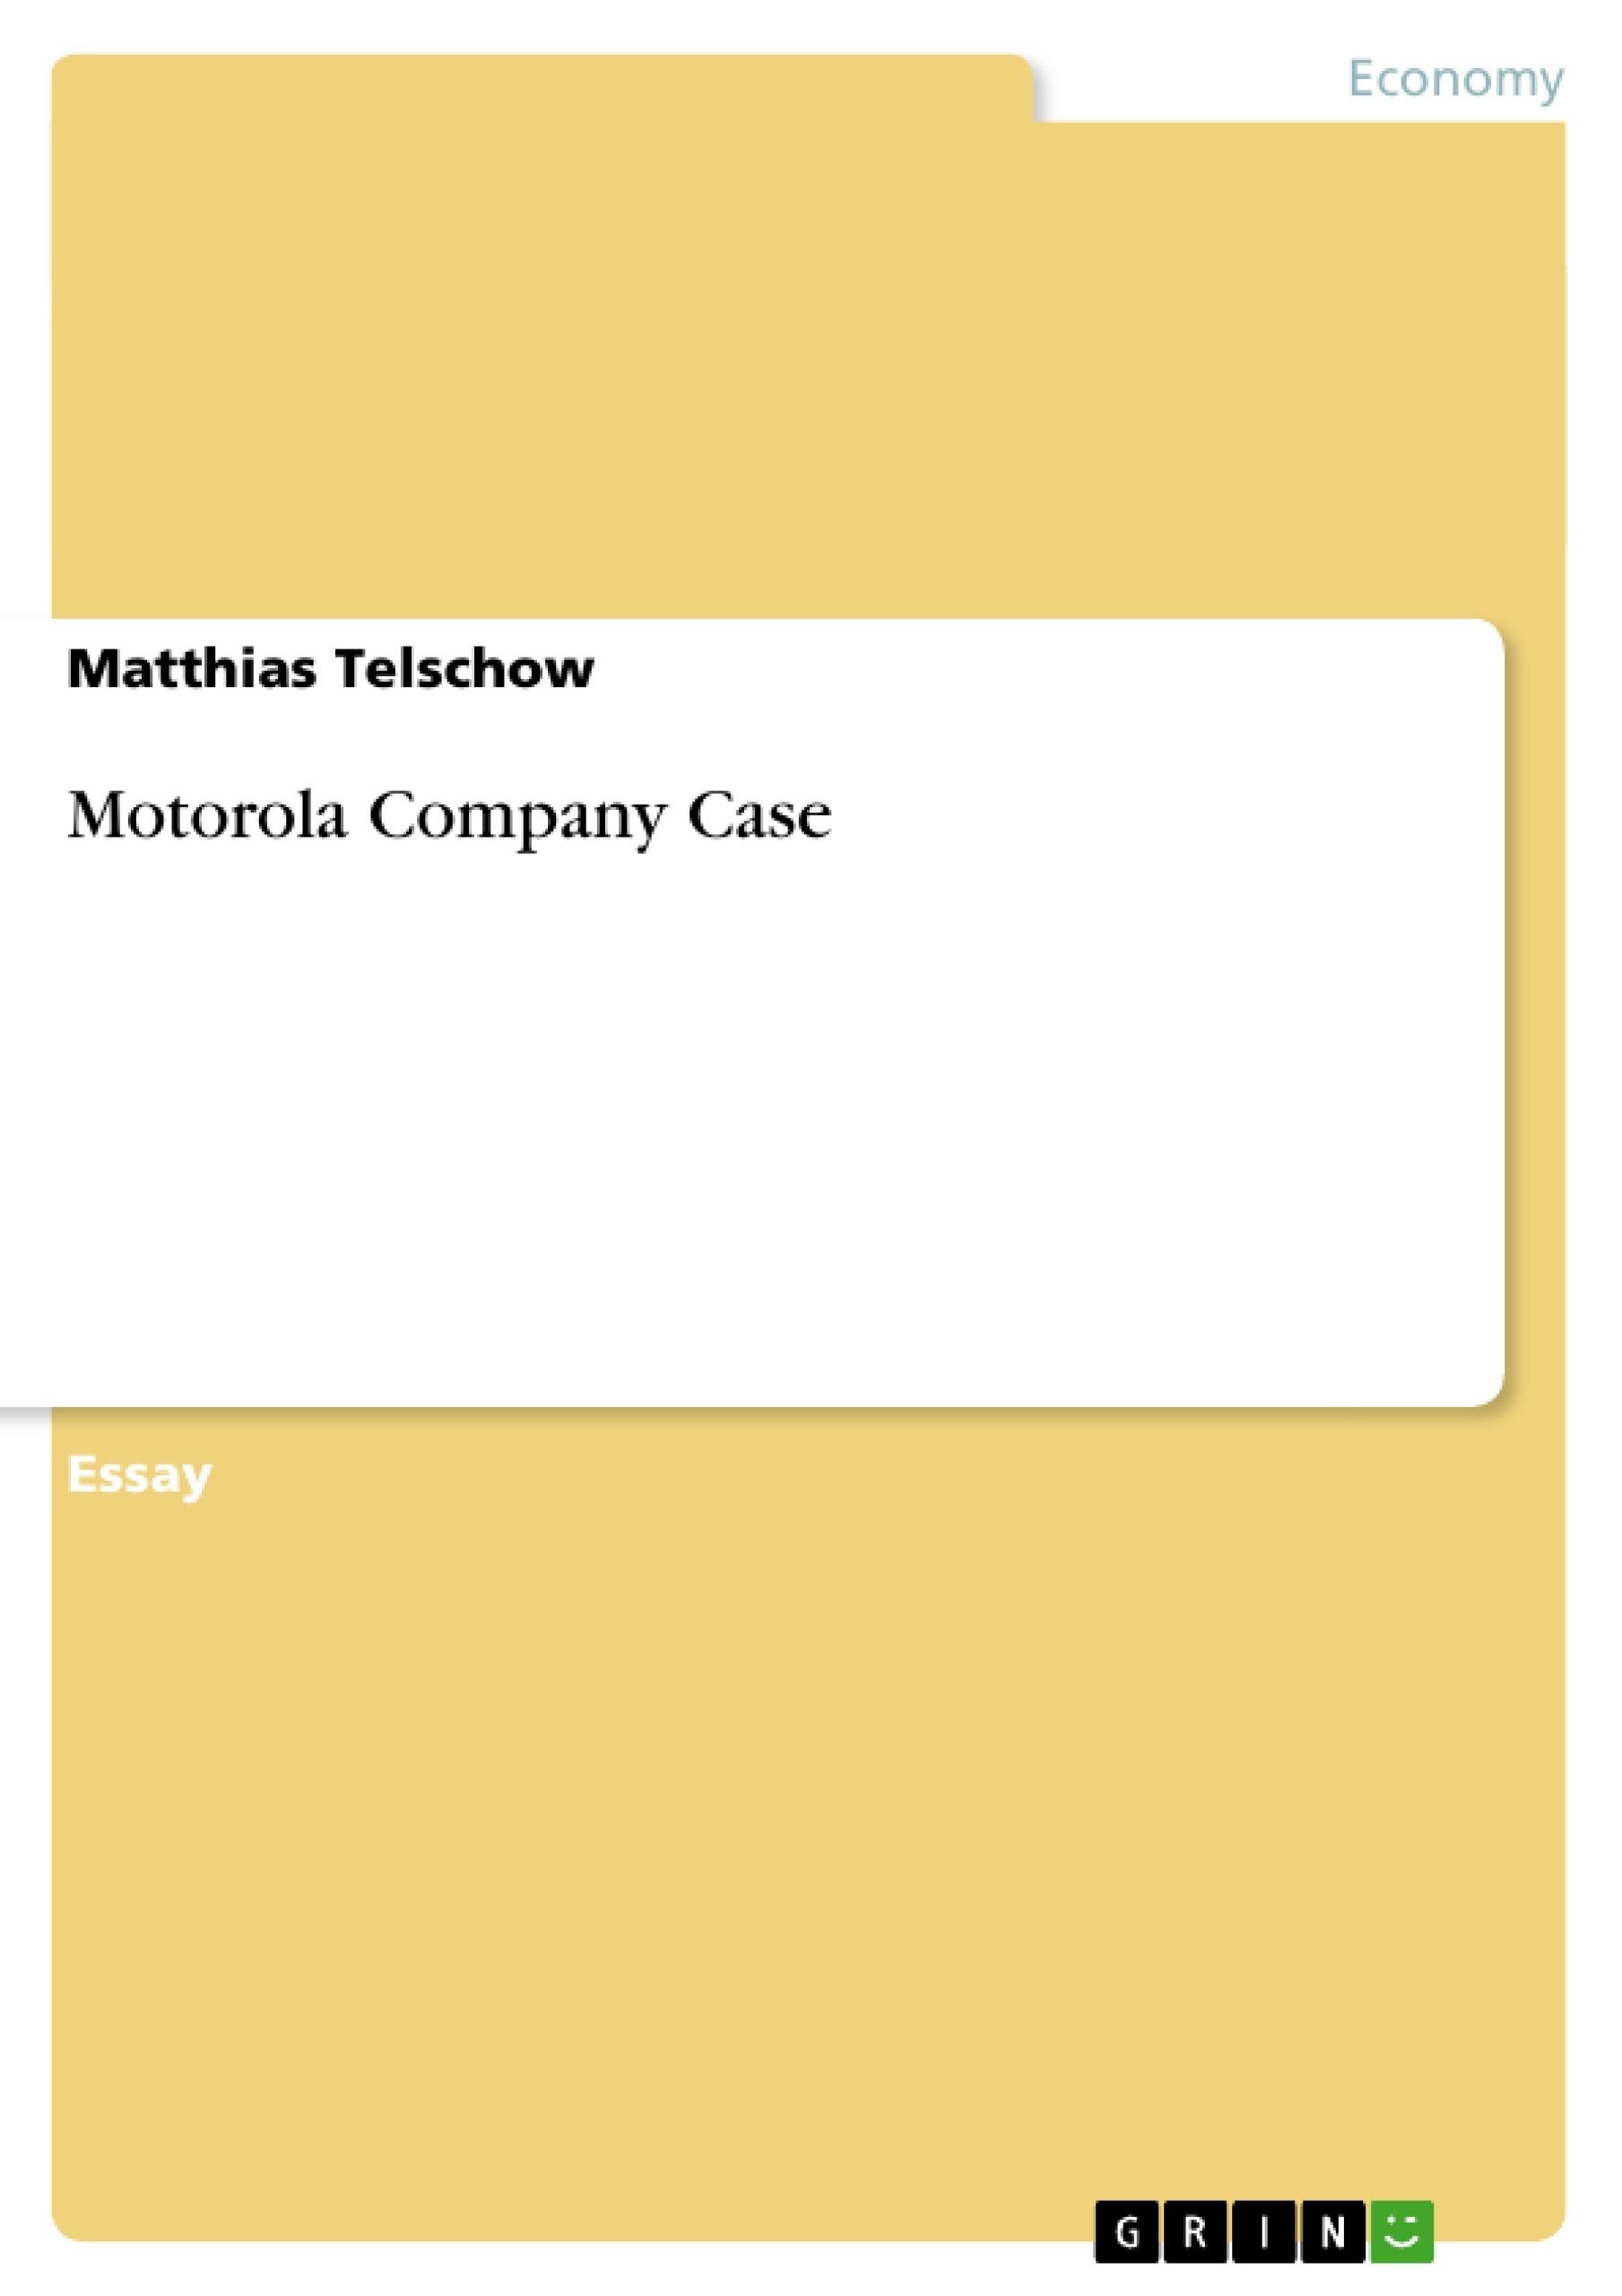 motorola company case publish your master s thesis bachelor s motorola company case publish your master s thesis bachelor s thesis essay or term paper